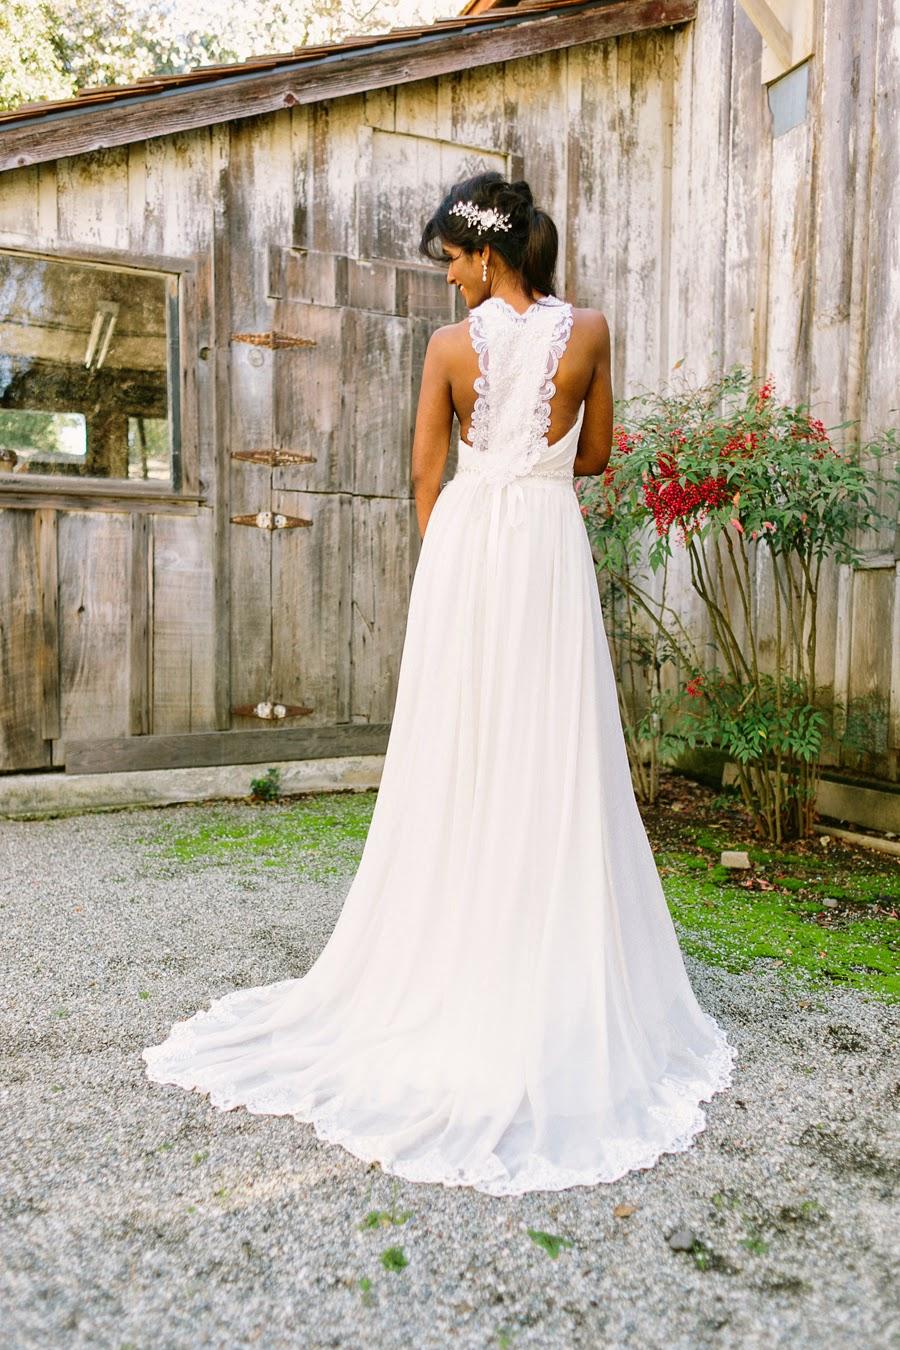 Anatomy Bridal Designer Trunk Show Of In Wedding Dresses